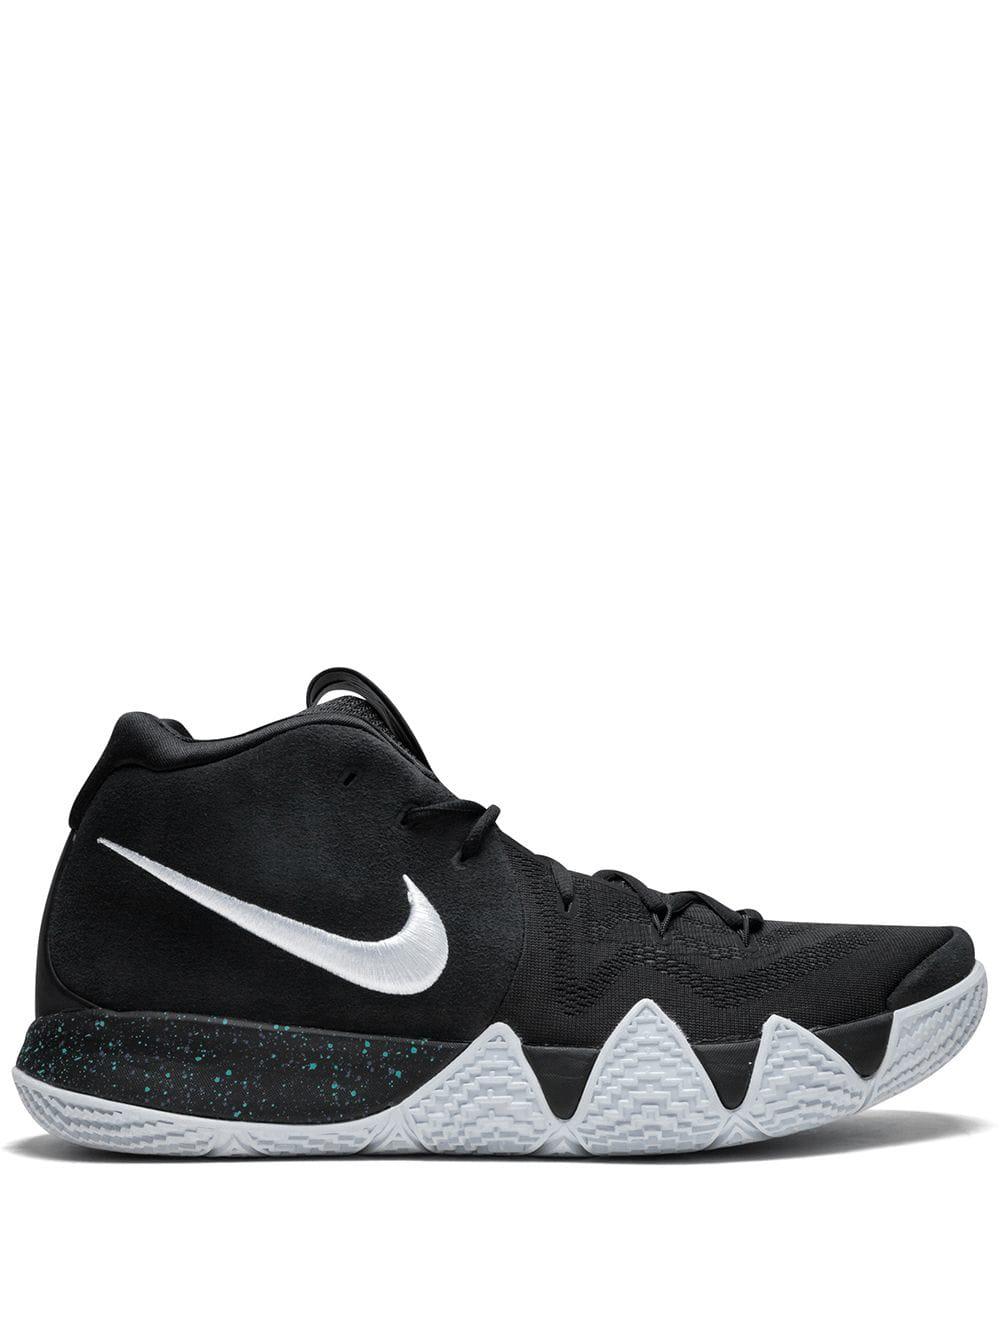 efb603f2e7ec Nike Kyrie 4 Hi-Top Sneakers - Black. Farfetch